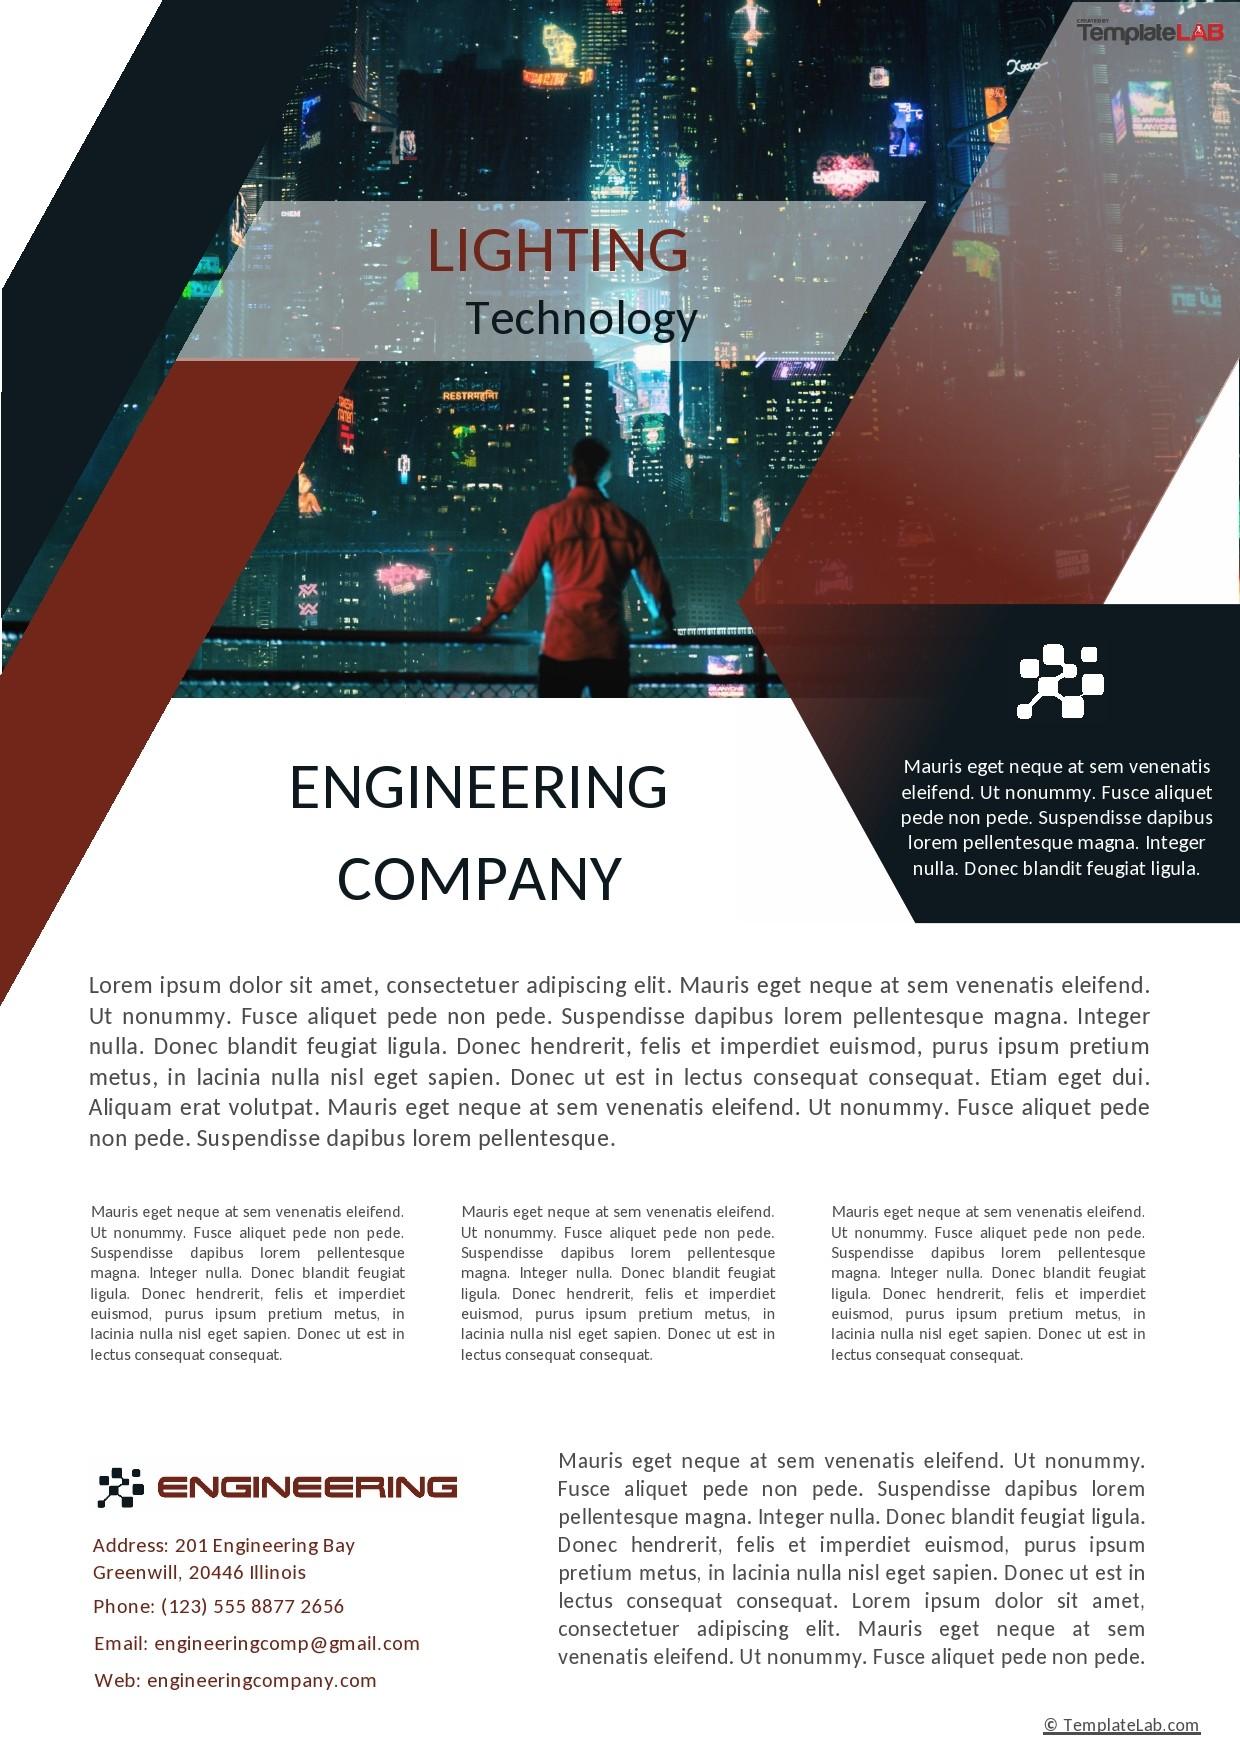 Free Engineering Company Profile Template - TemplateLab.com